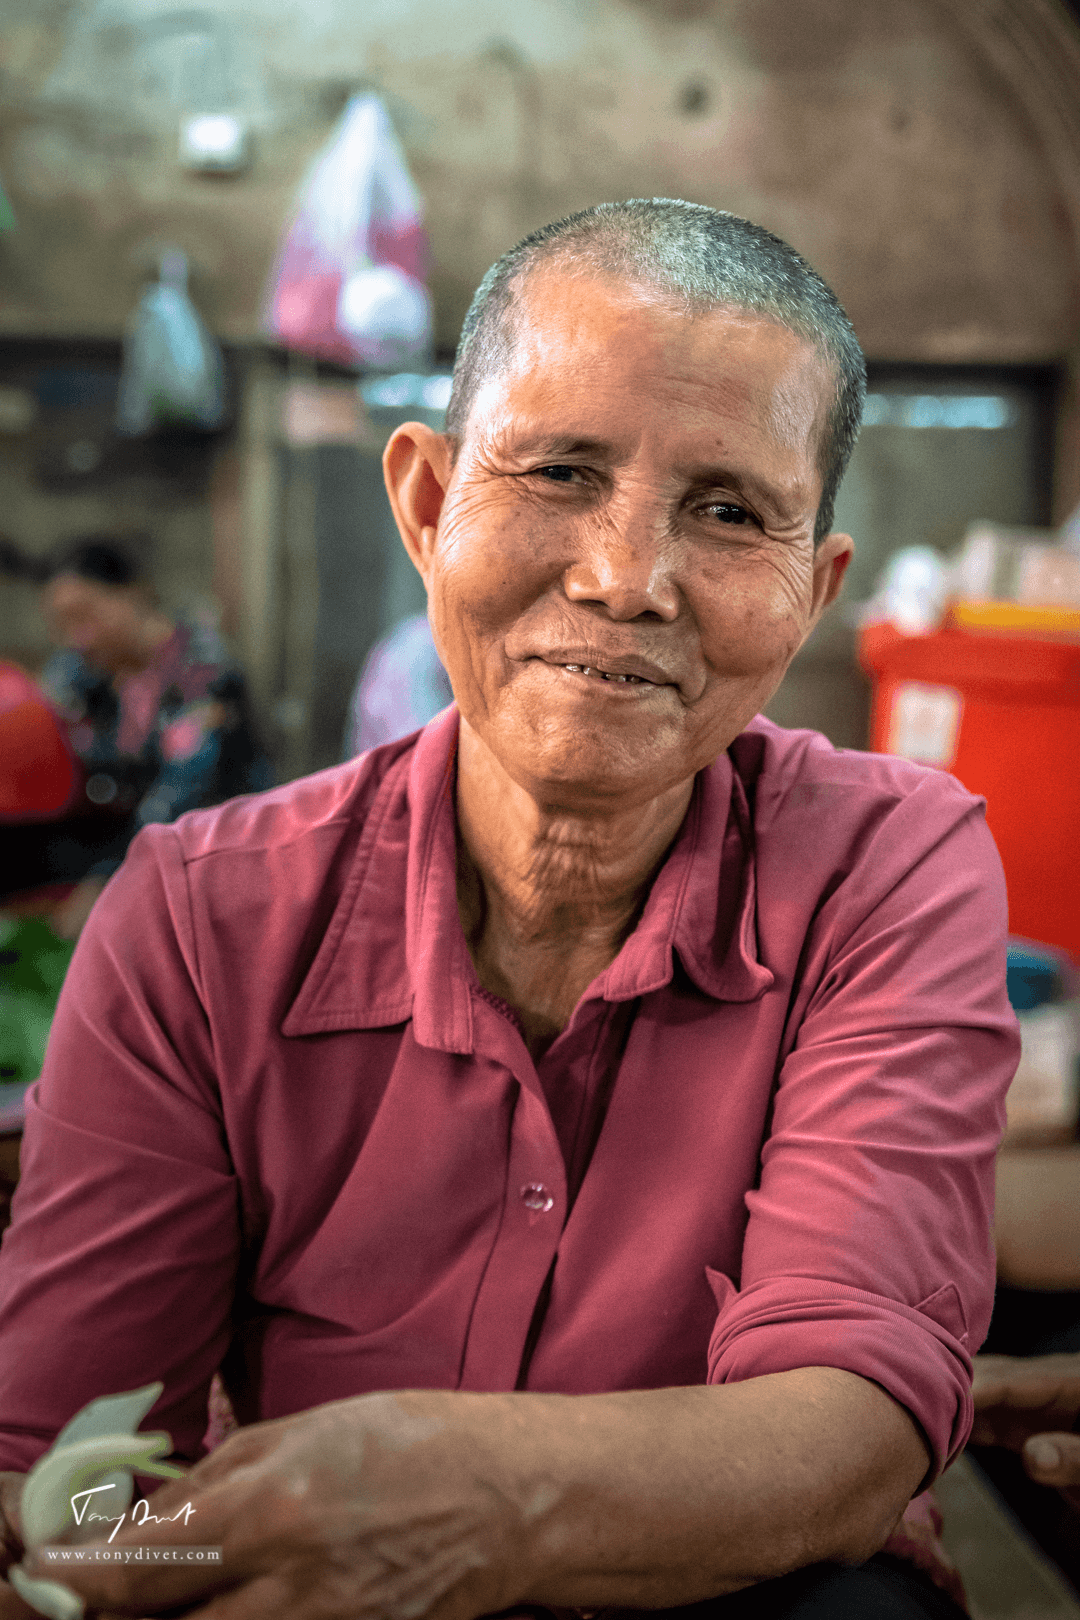 Cambodge-9564